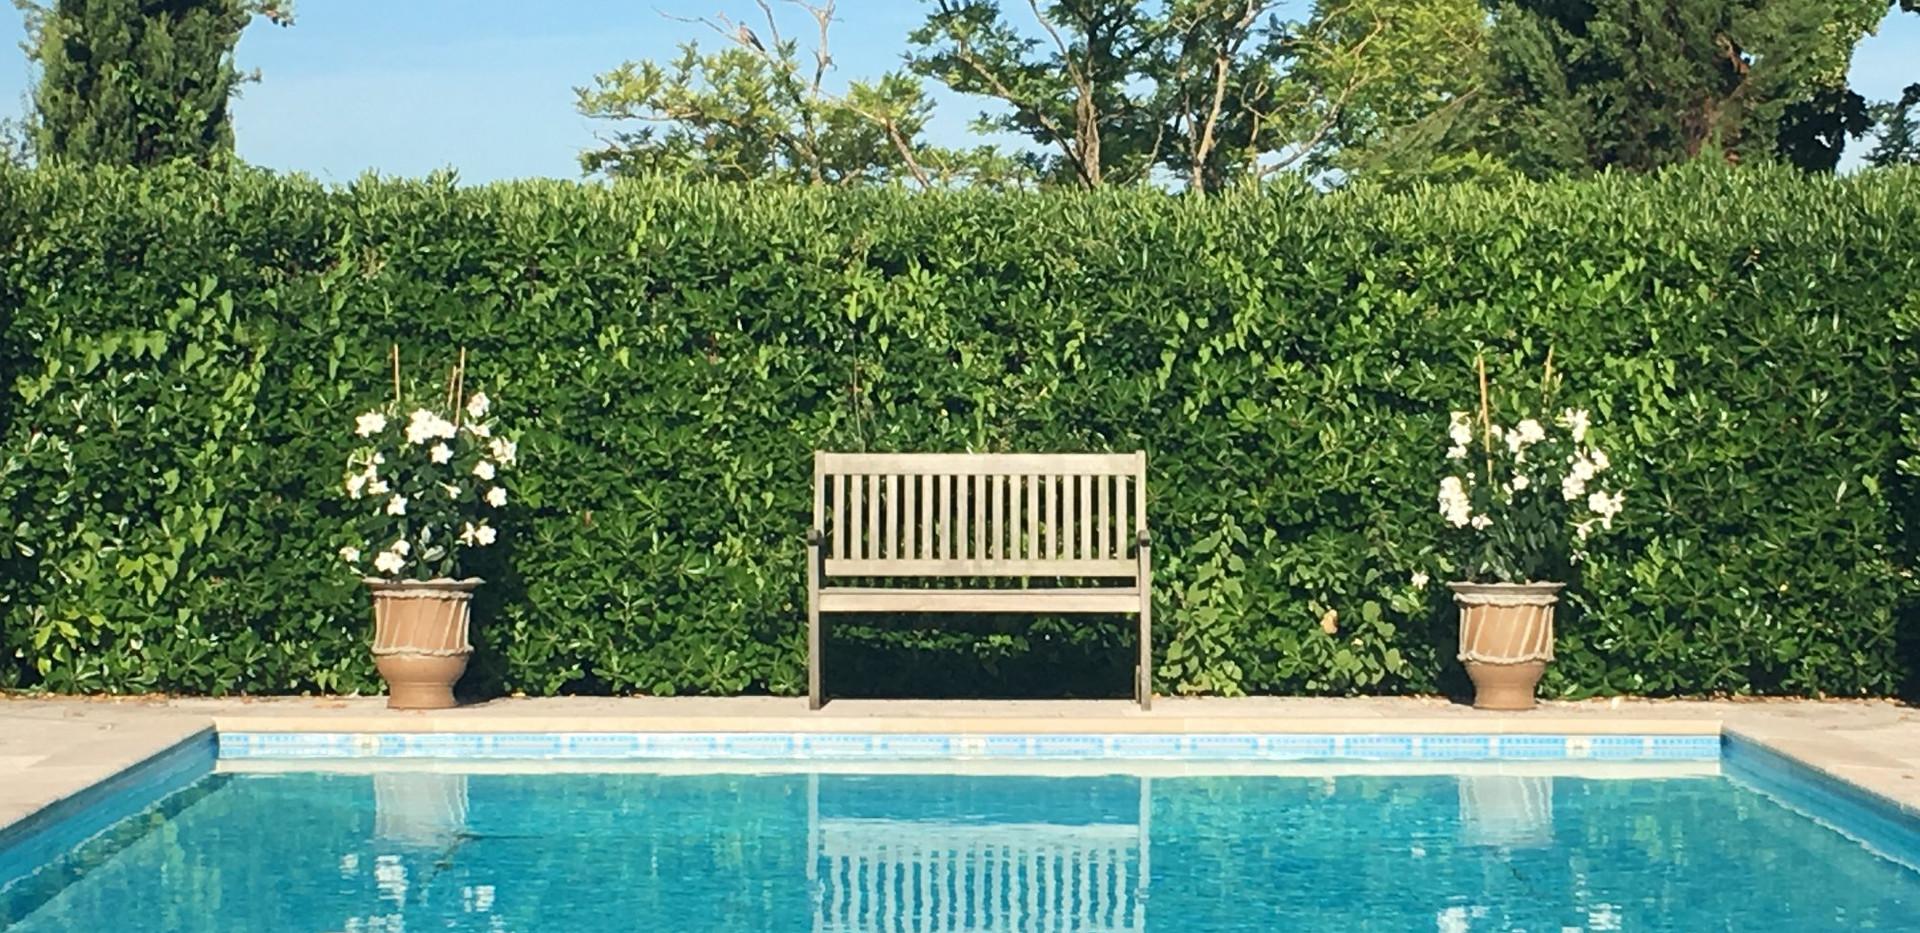 Pool for Nicola.jpg